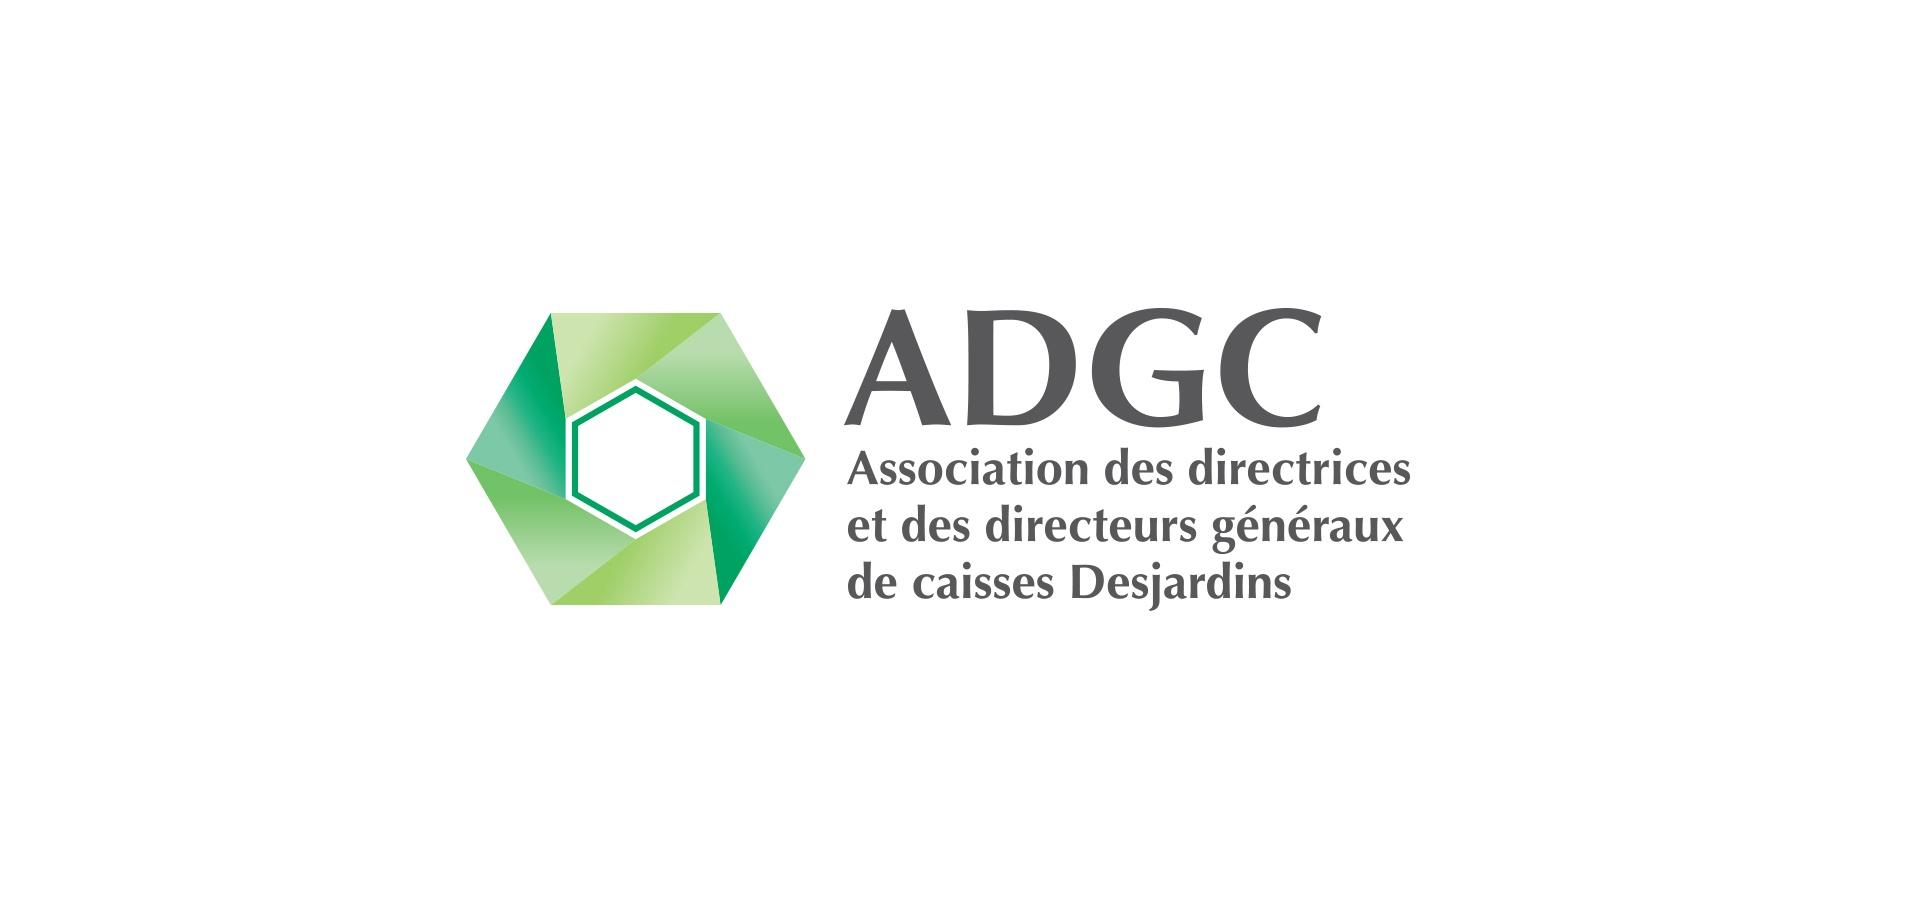 ADGC_logo.jpg